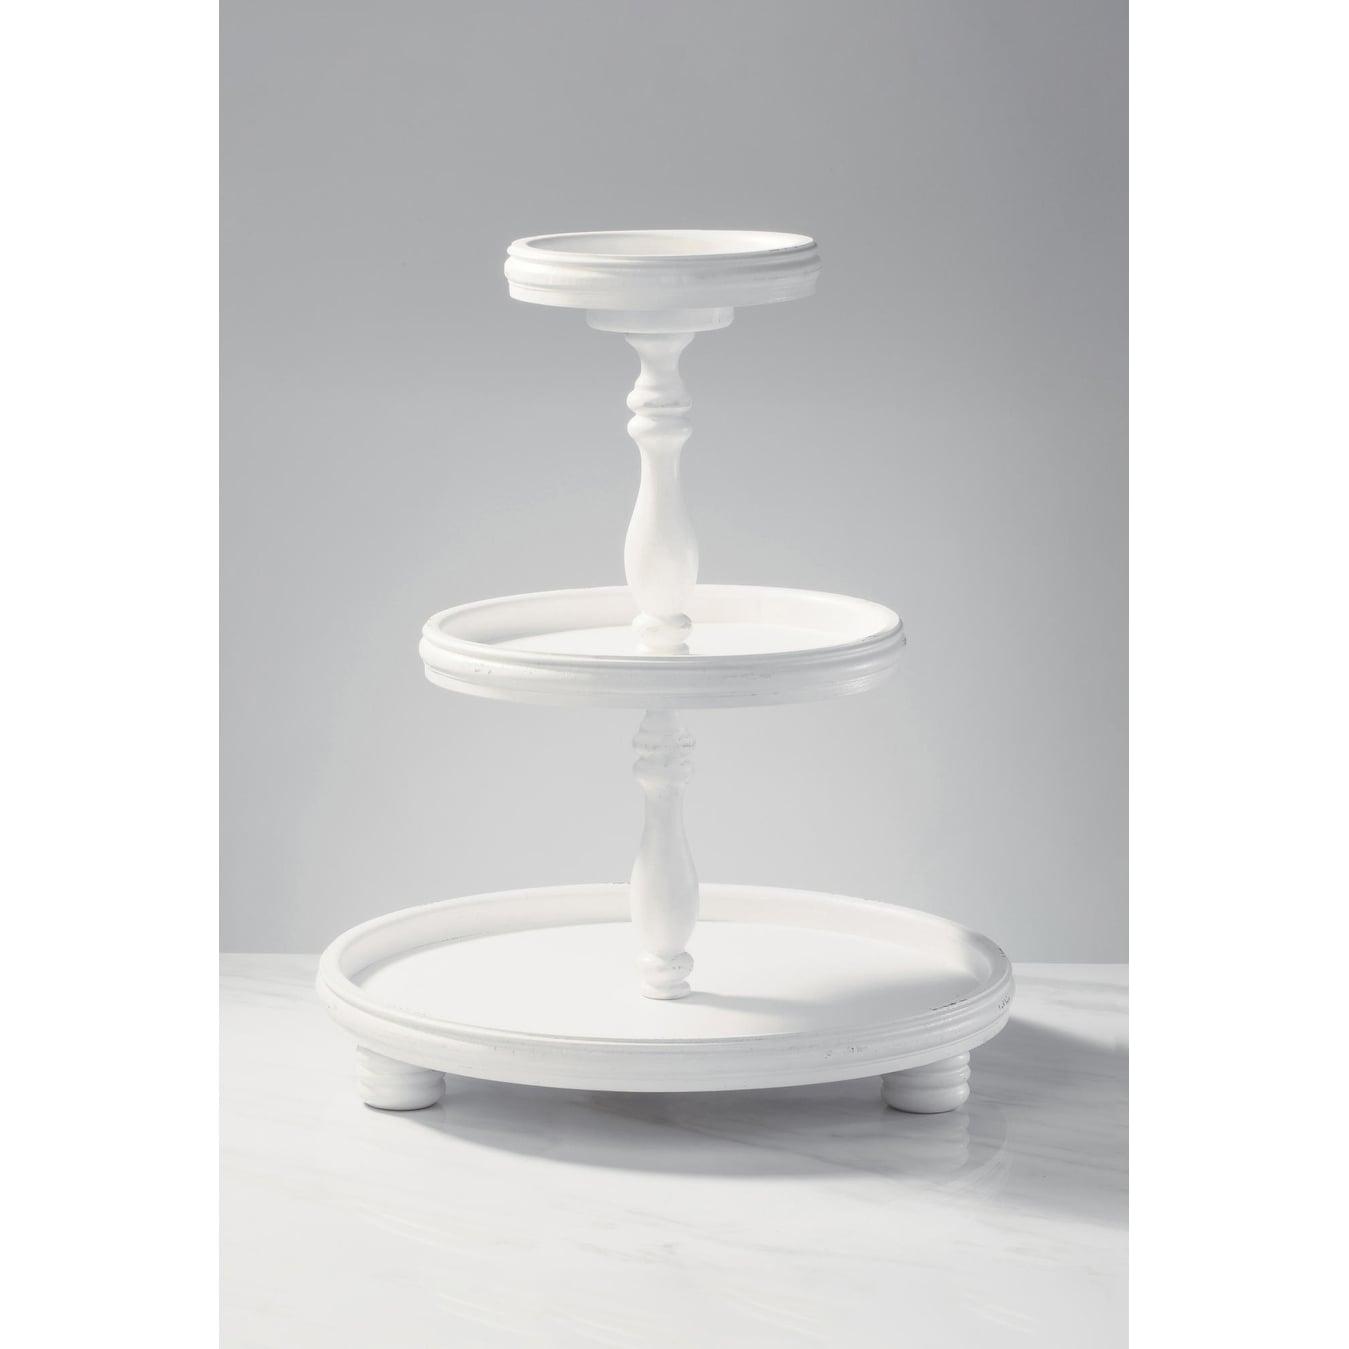 Three Tier Wooden Display Stand Overstock 16429085